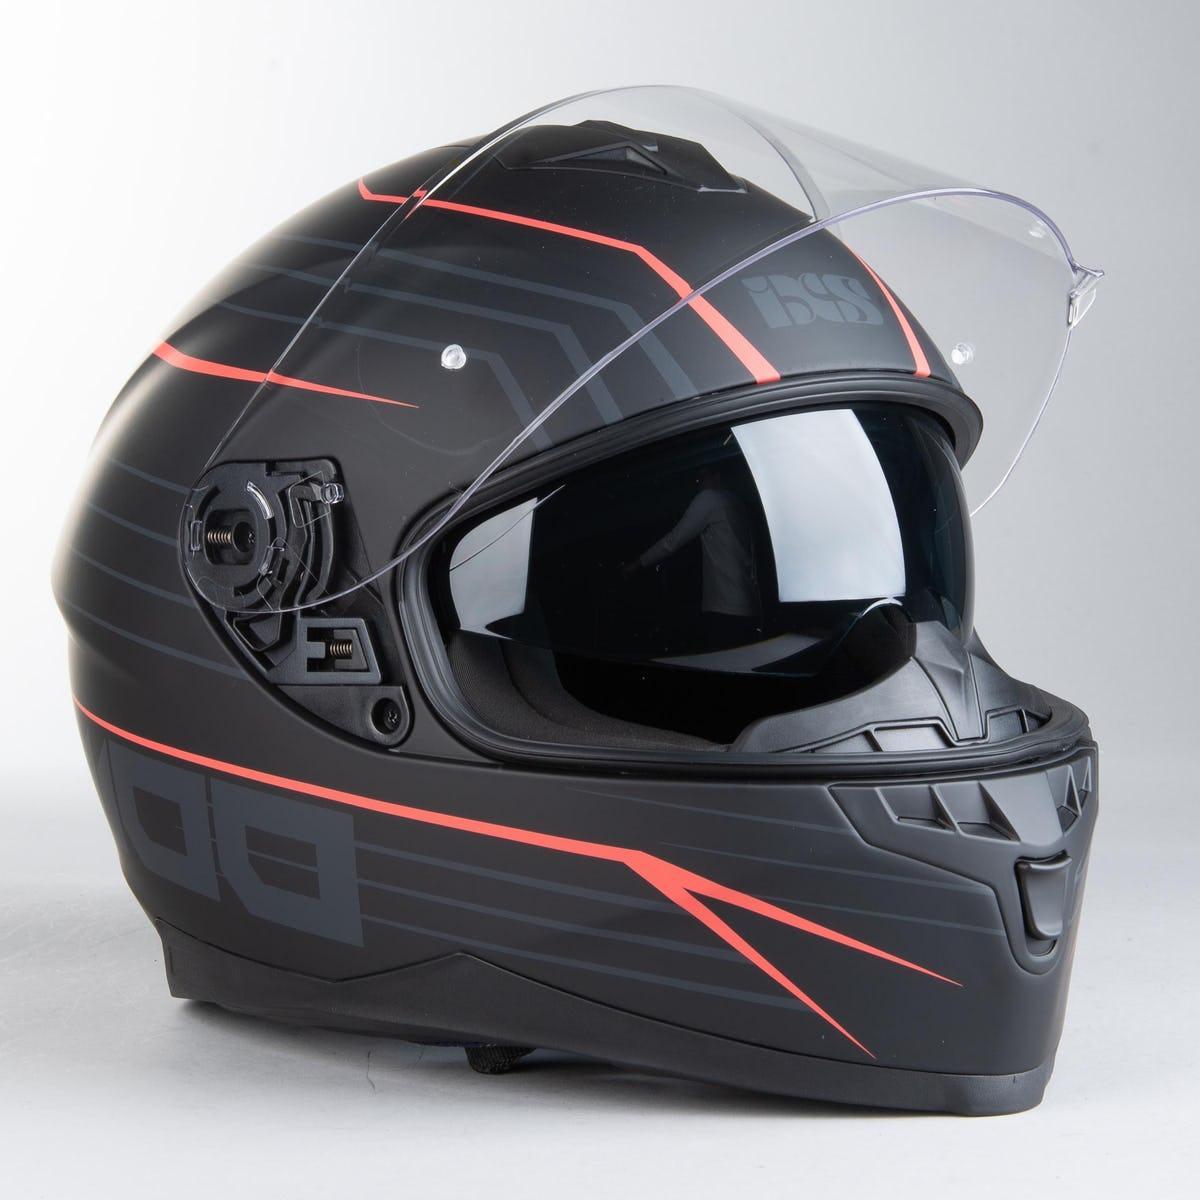 Шлем интеграл IXS 1100 2.1 Full Face Helmet Matte Black-Red  Мат